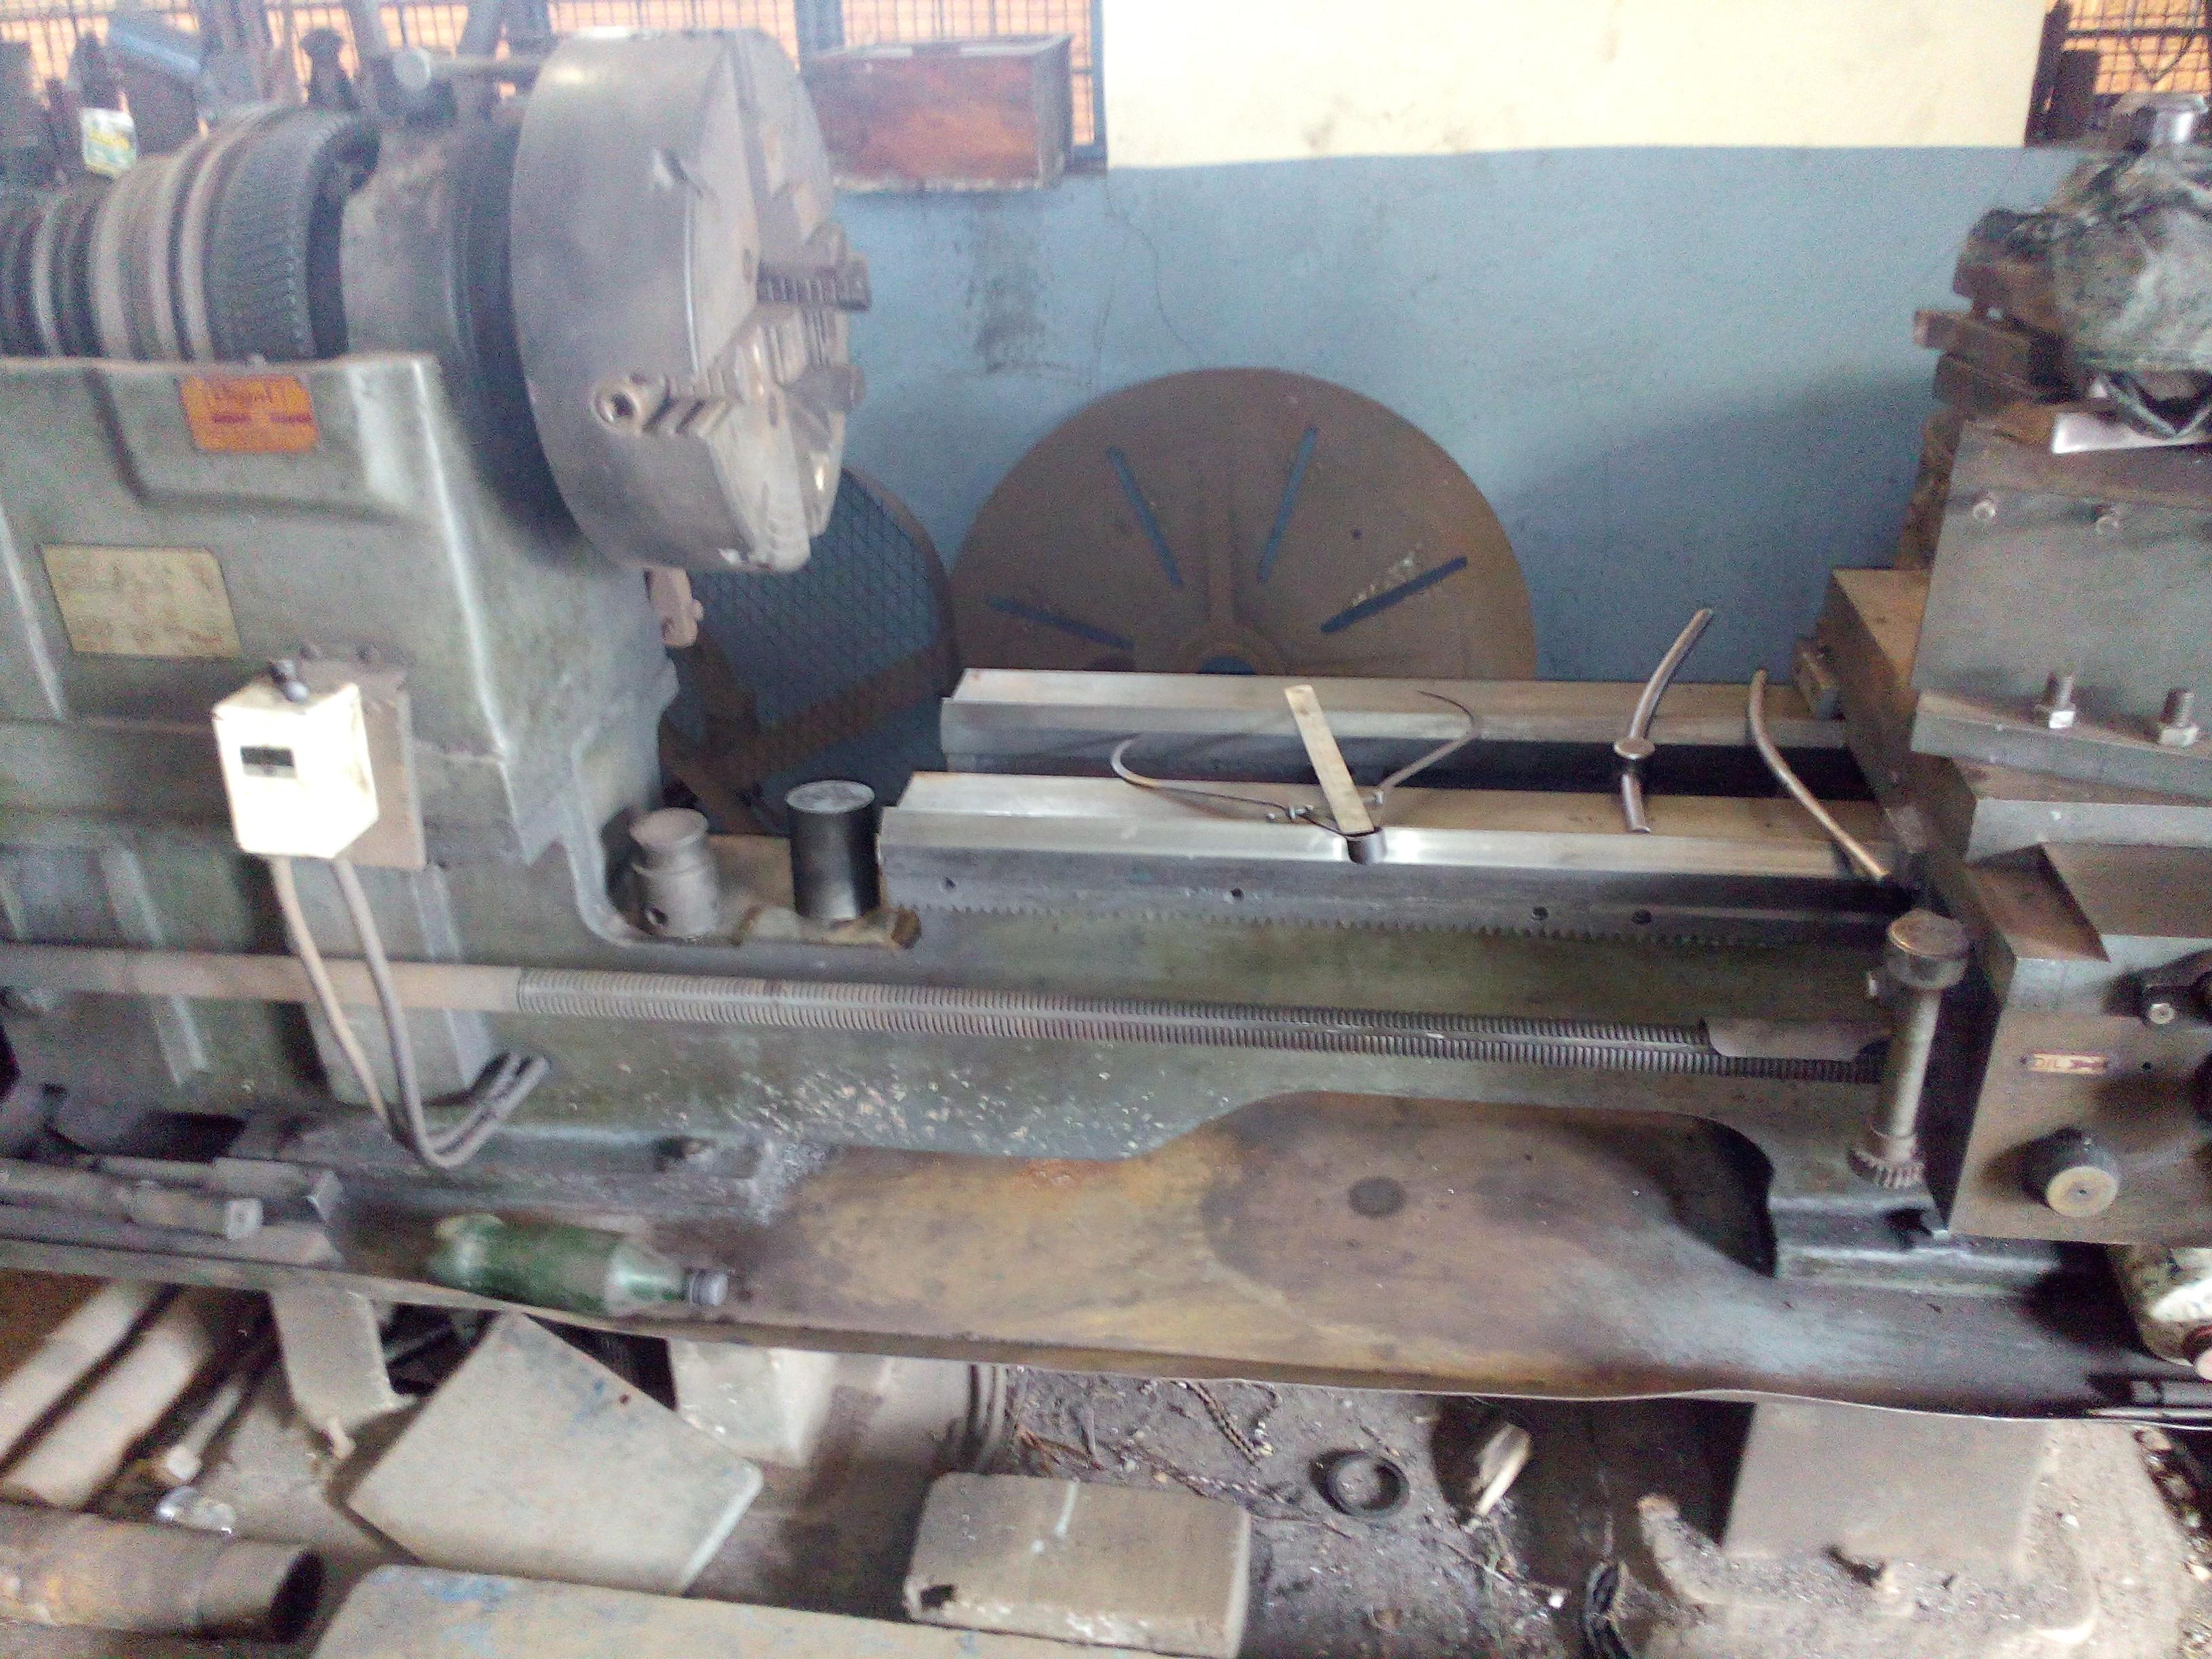 Supari cutting machines